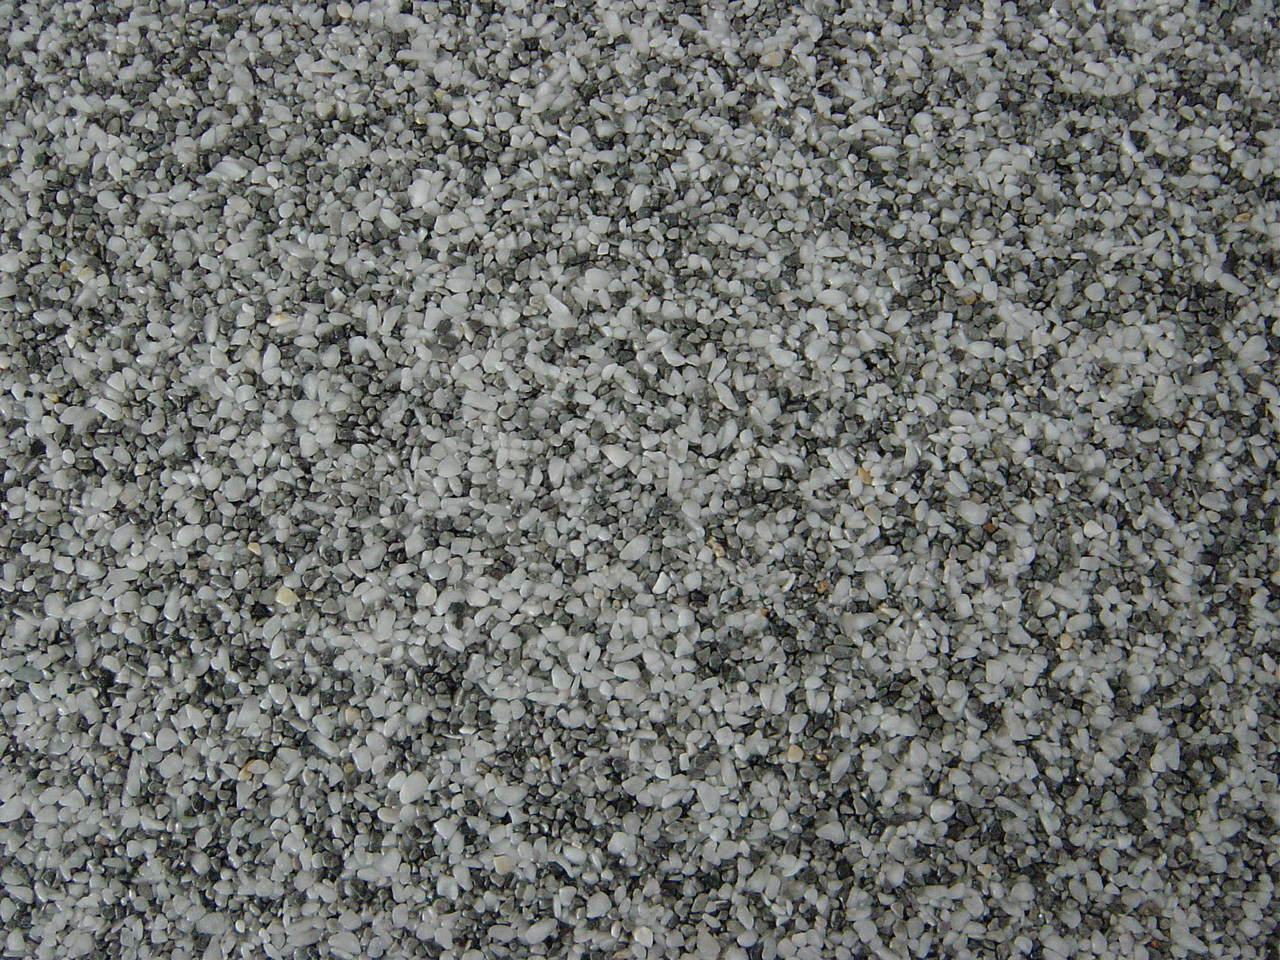 STEINTEPPICH, MARMOR 2m²  WEISS  GRAU 2-6 mm